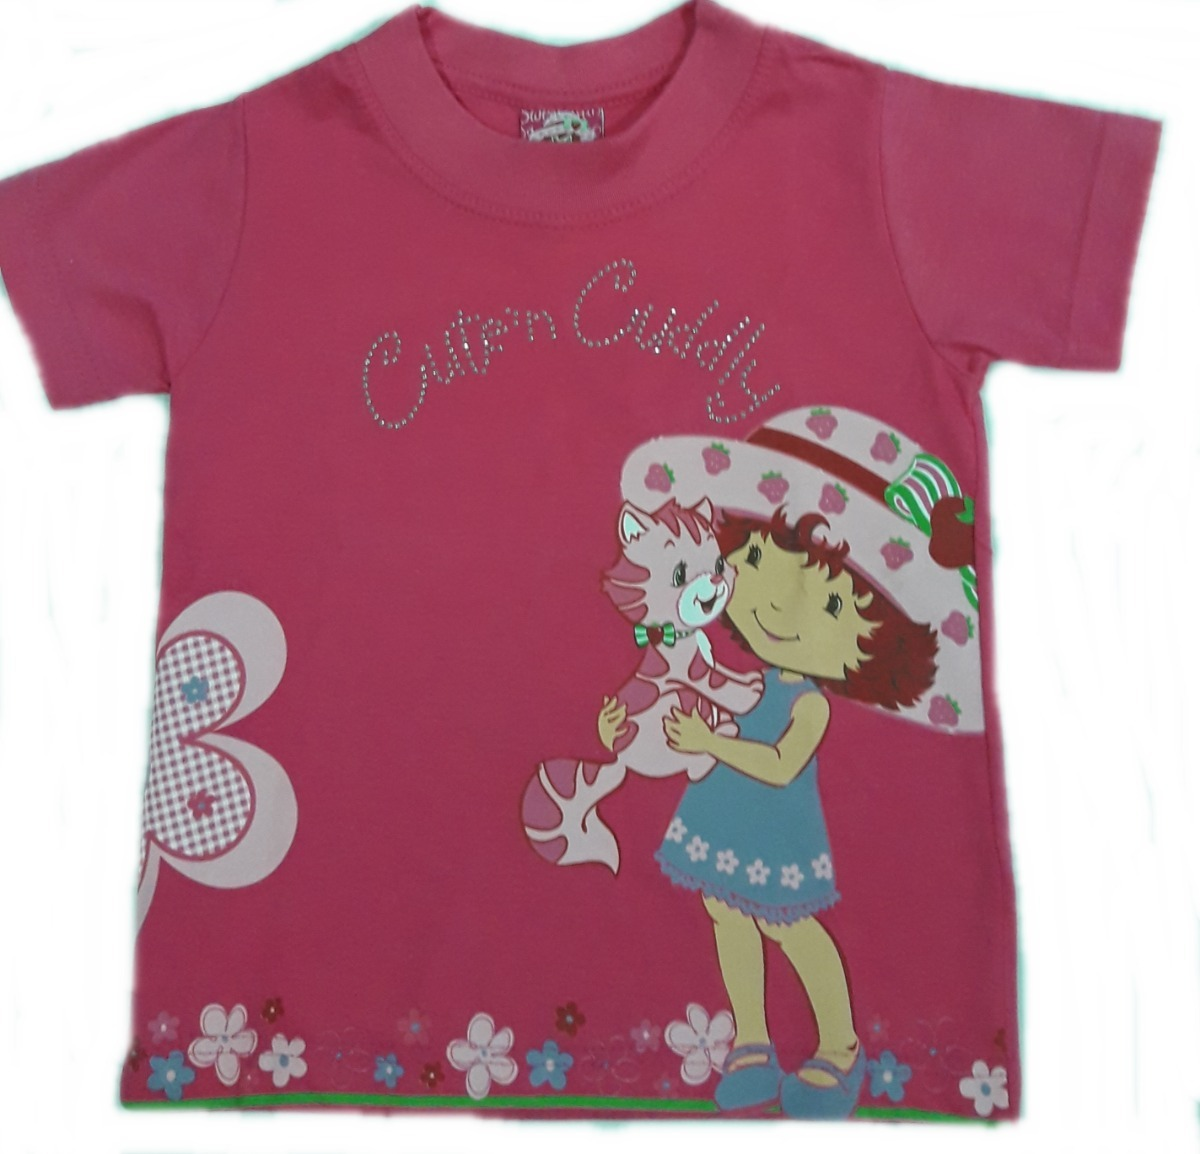 83a90aaa3a Camiseta Feminina Moranguinho Corte Grande Malwee Nº 1 - R  32